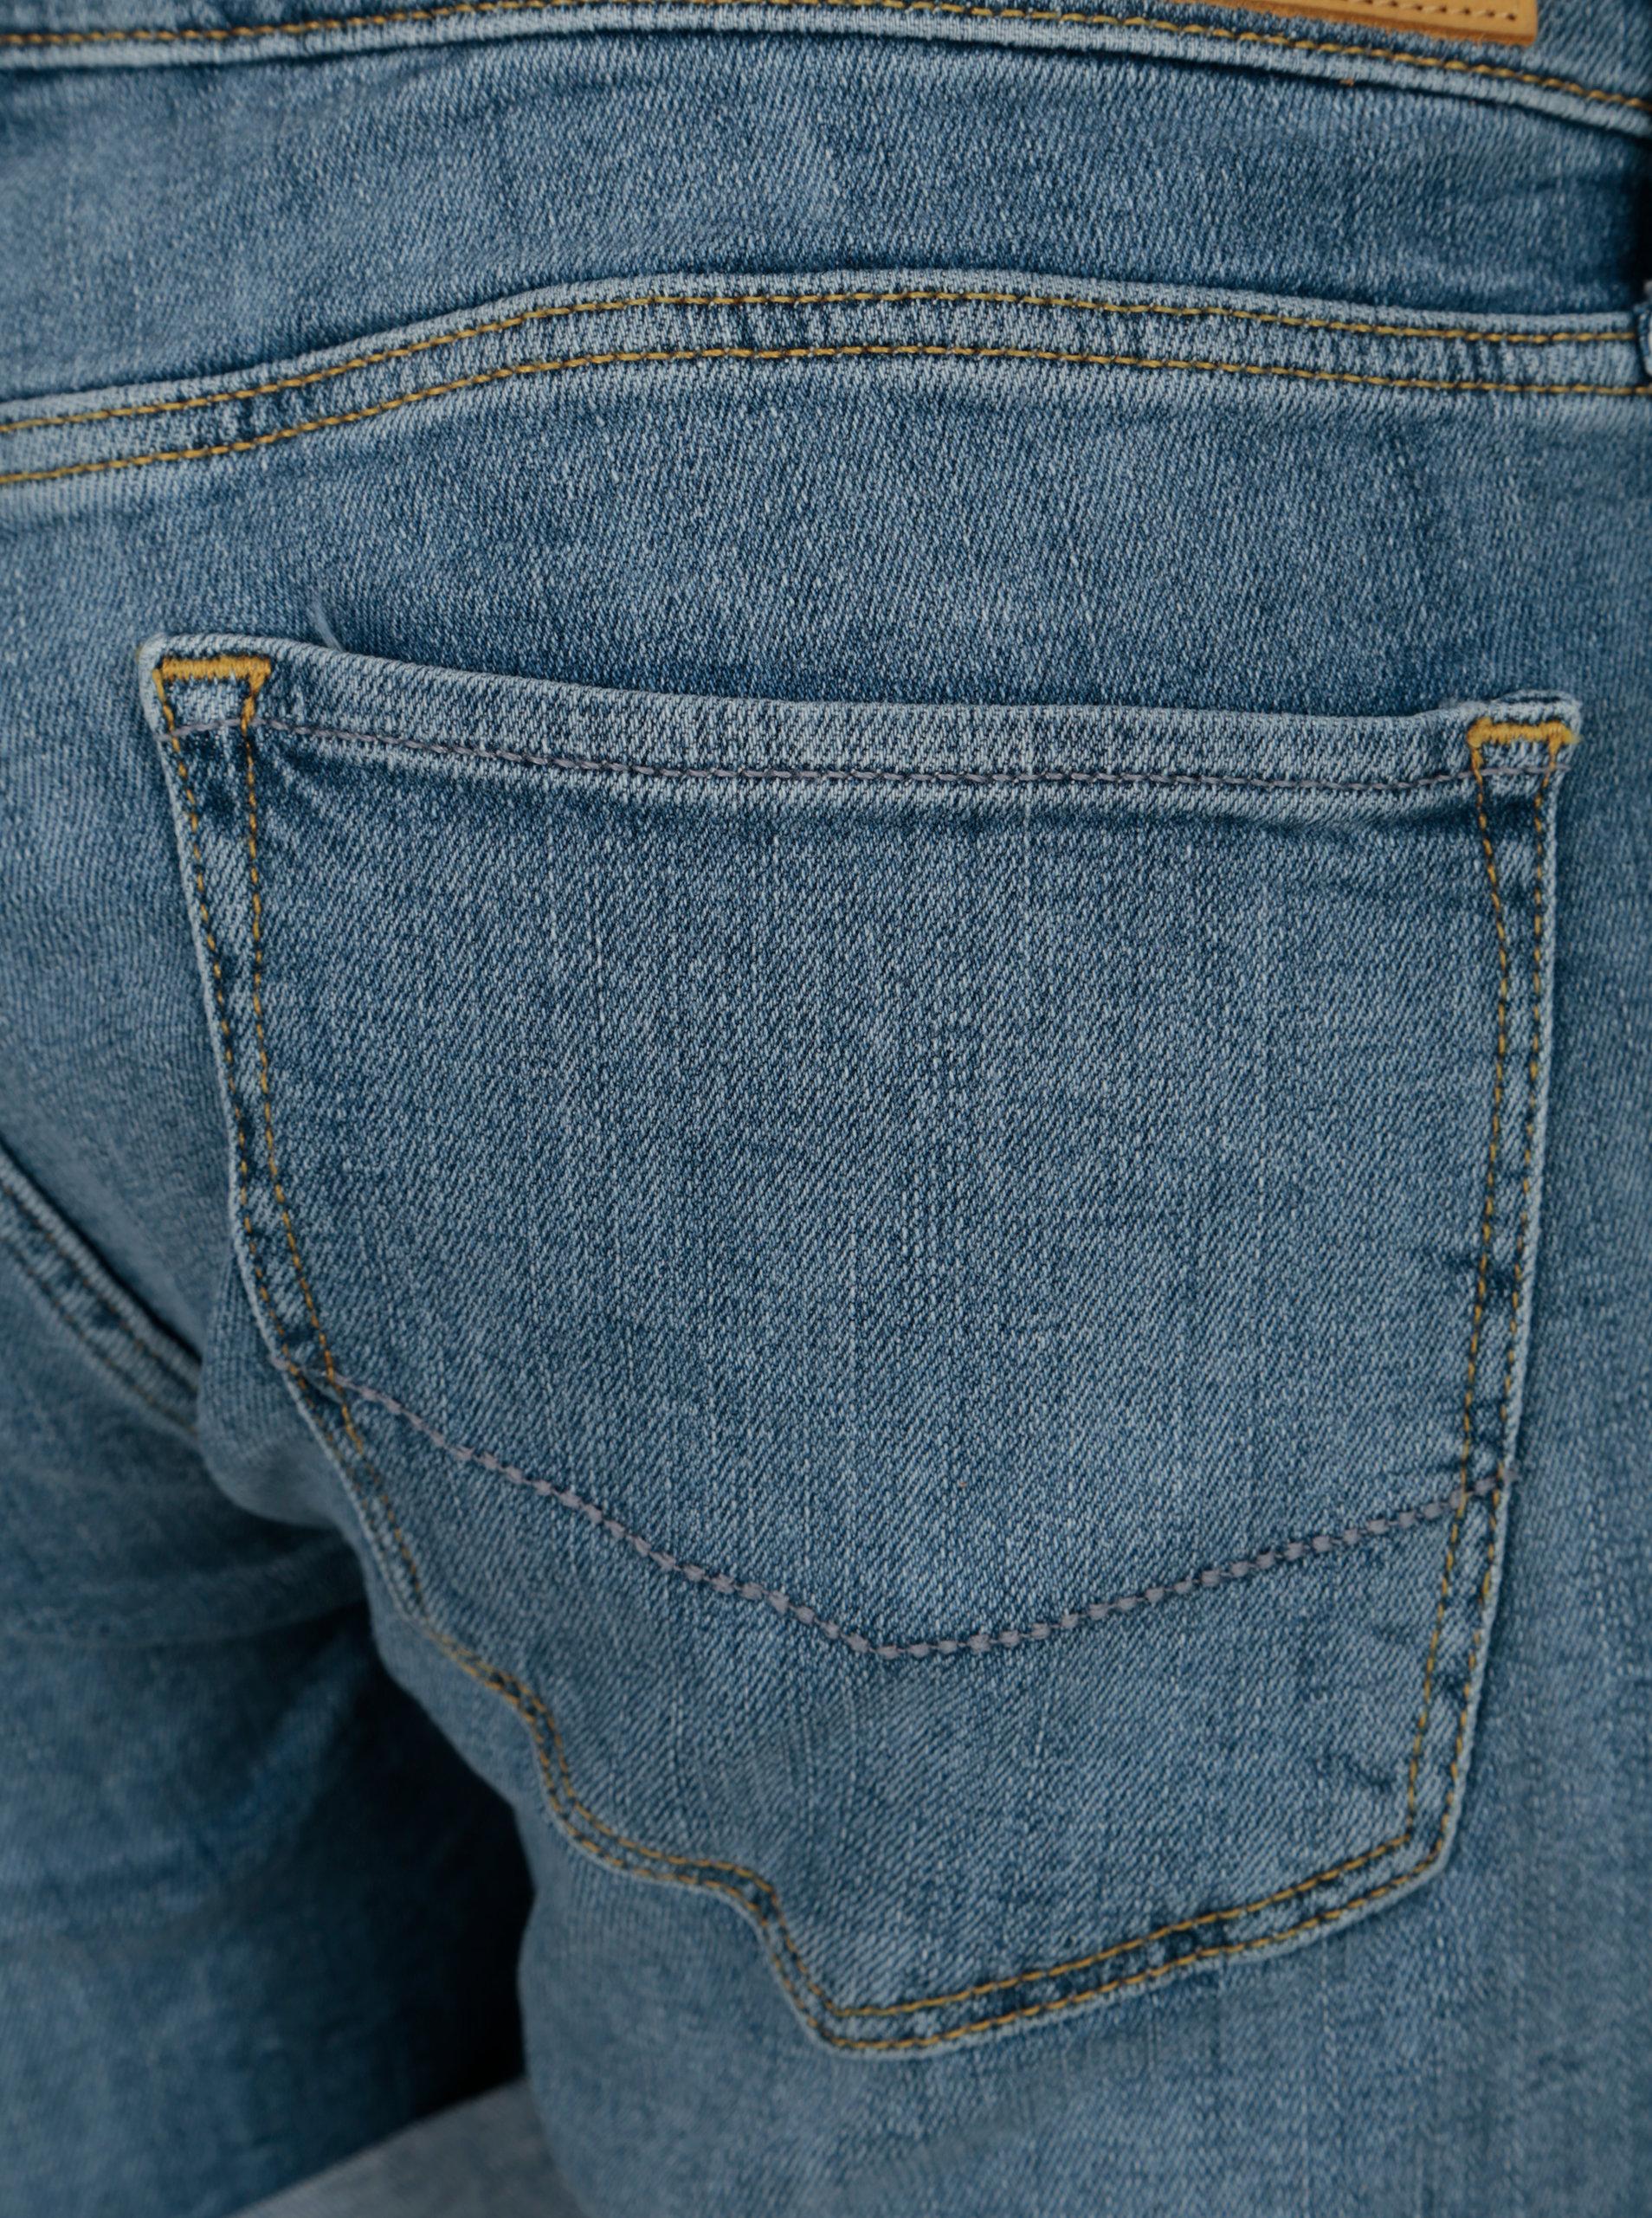 9f1ac5bd4ccd Modré dámske regular rifľové kraťasy s nízkym pásom Cross Jeans ...